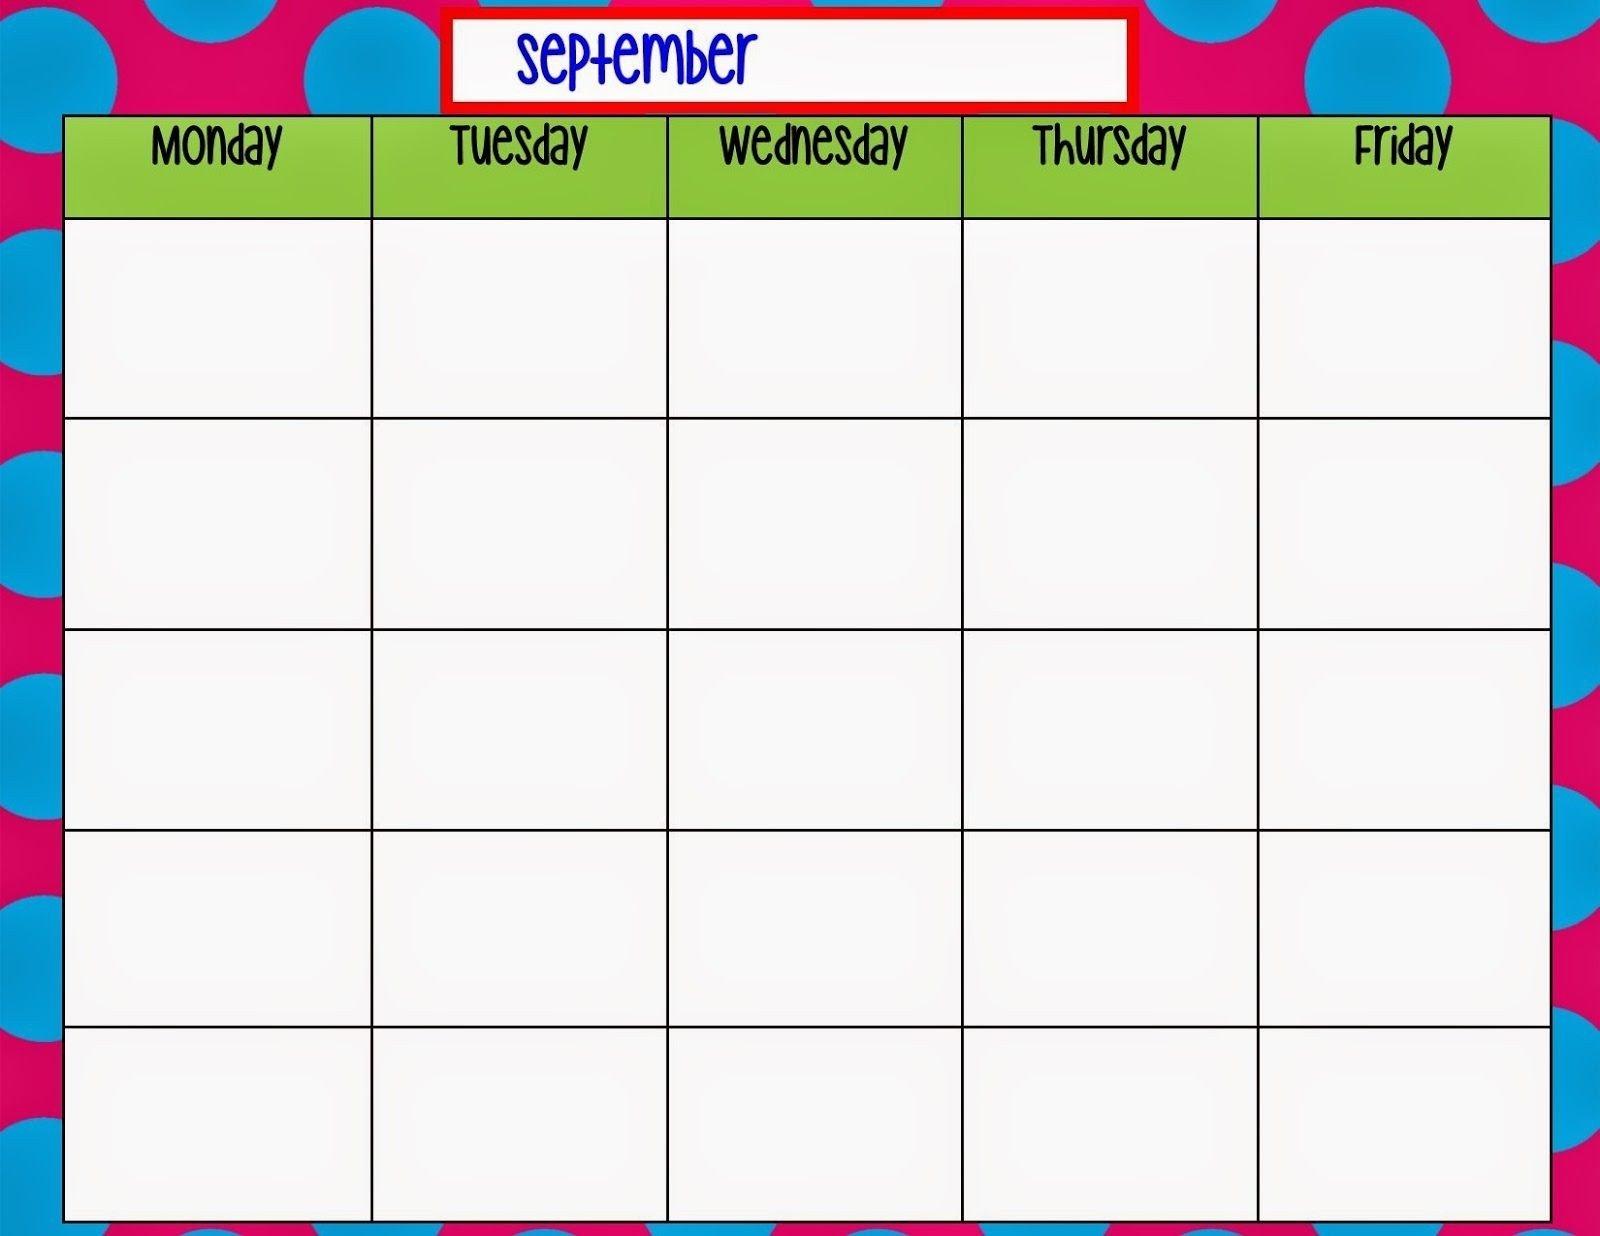 Monday To Friday Blank Calendar | Calendar Template Printable Blank Calendar Grid Moday Friday